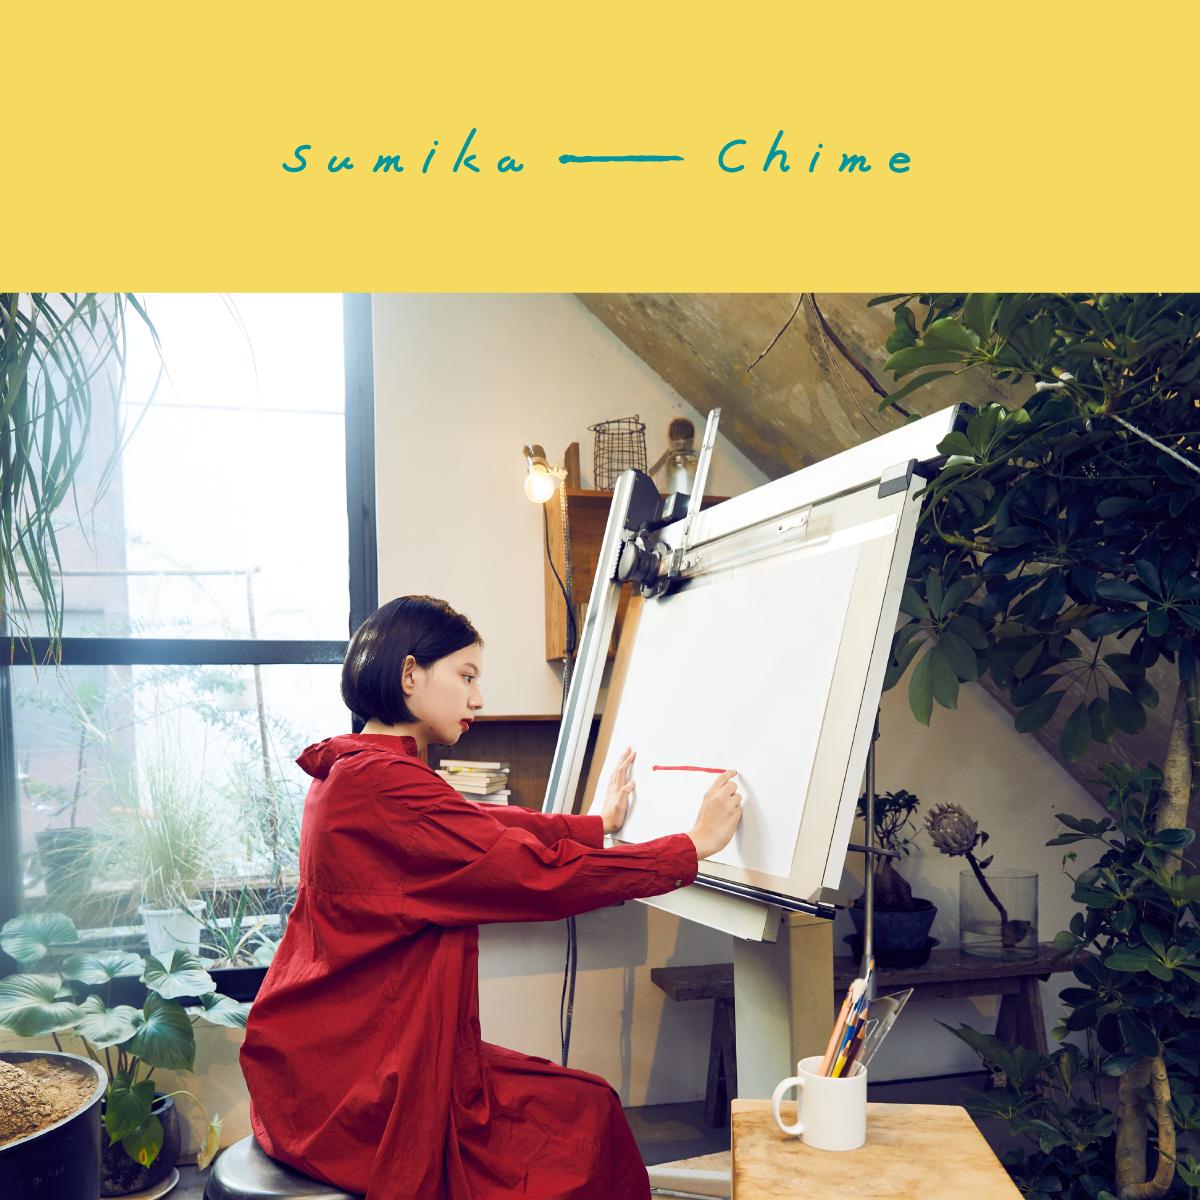 chime - photo #41